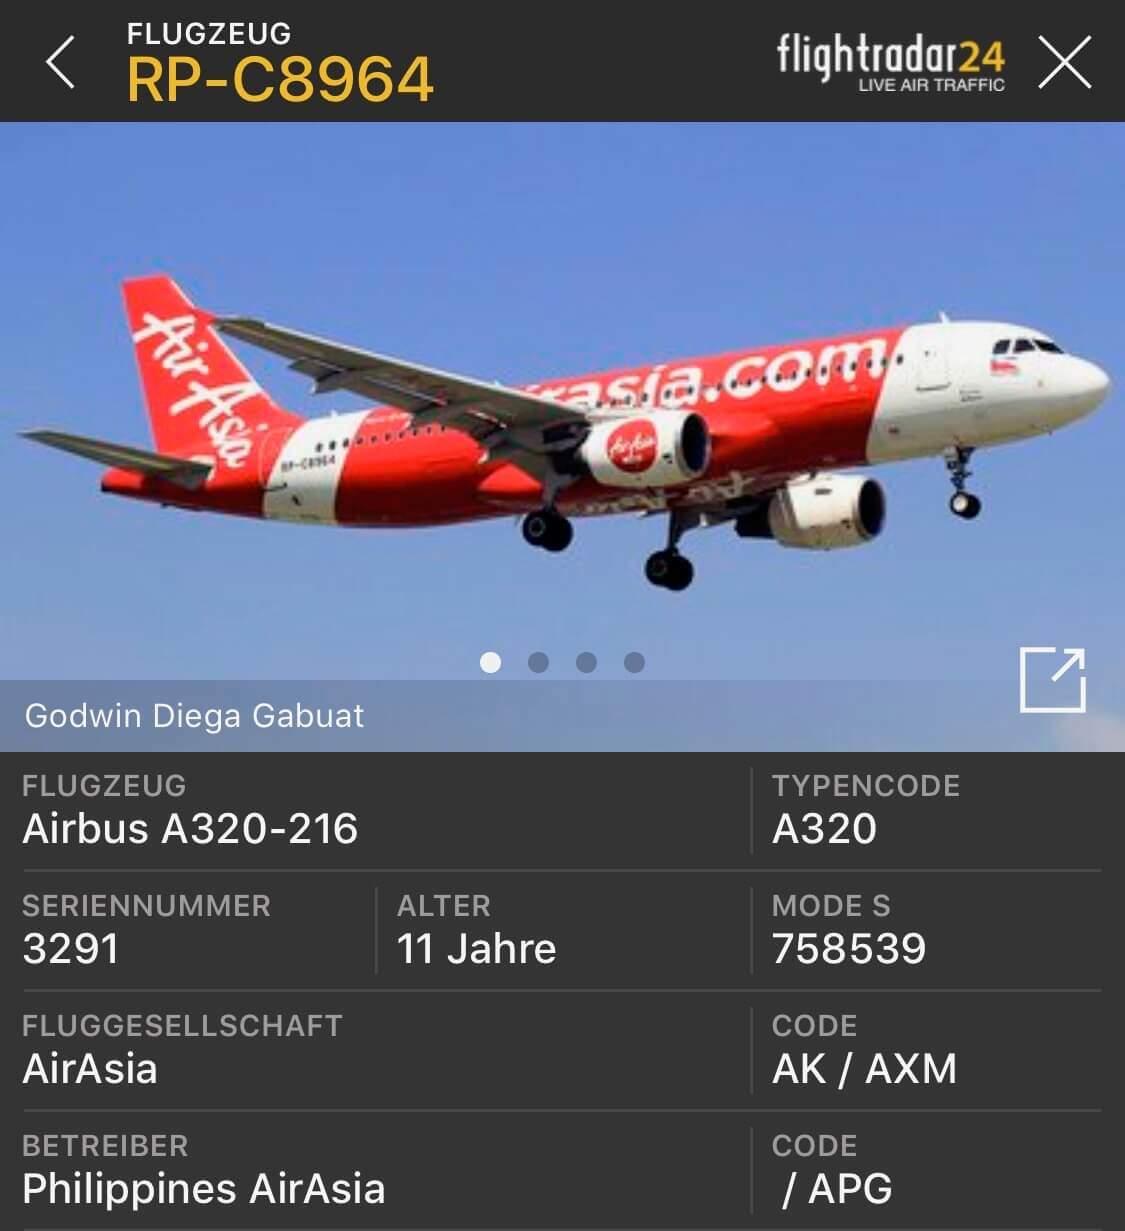 Philippines AirAsia Erfahrungen & Test (CRK-MPH) Z2921 Tripreport Flugzeugdaten